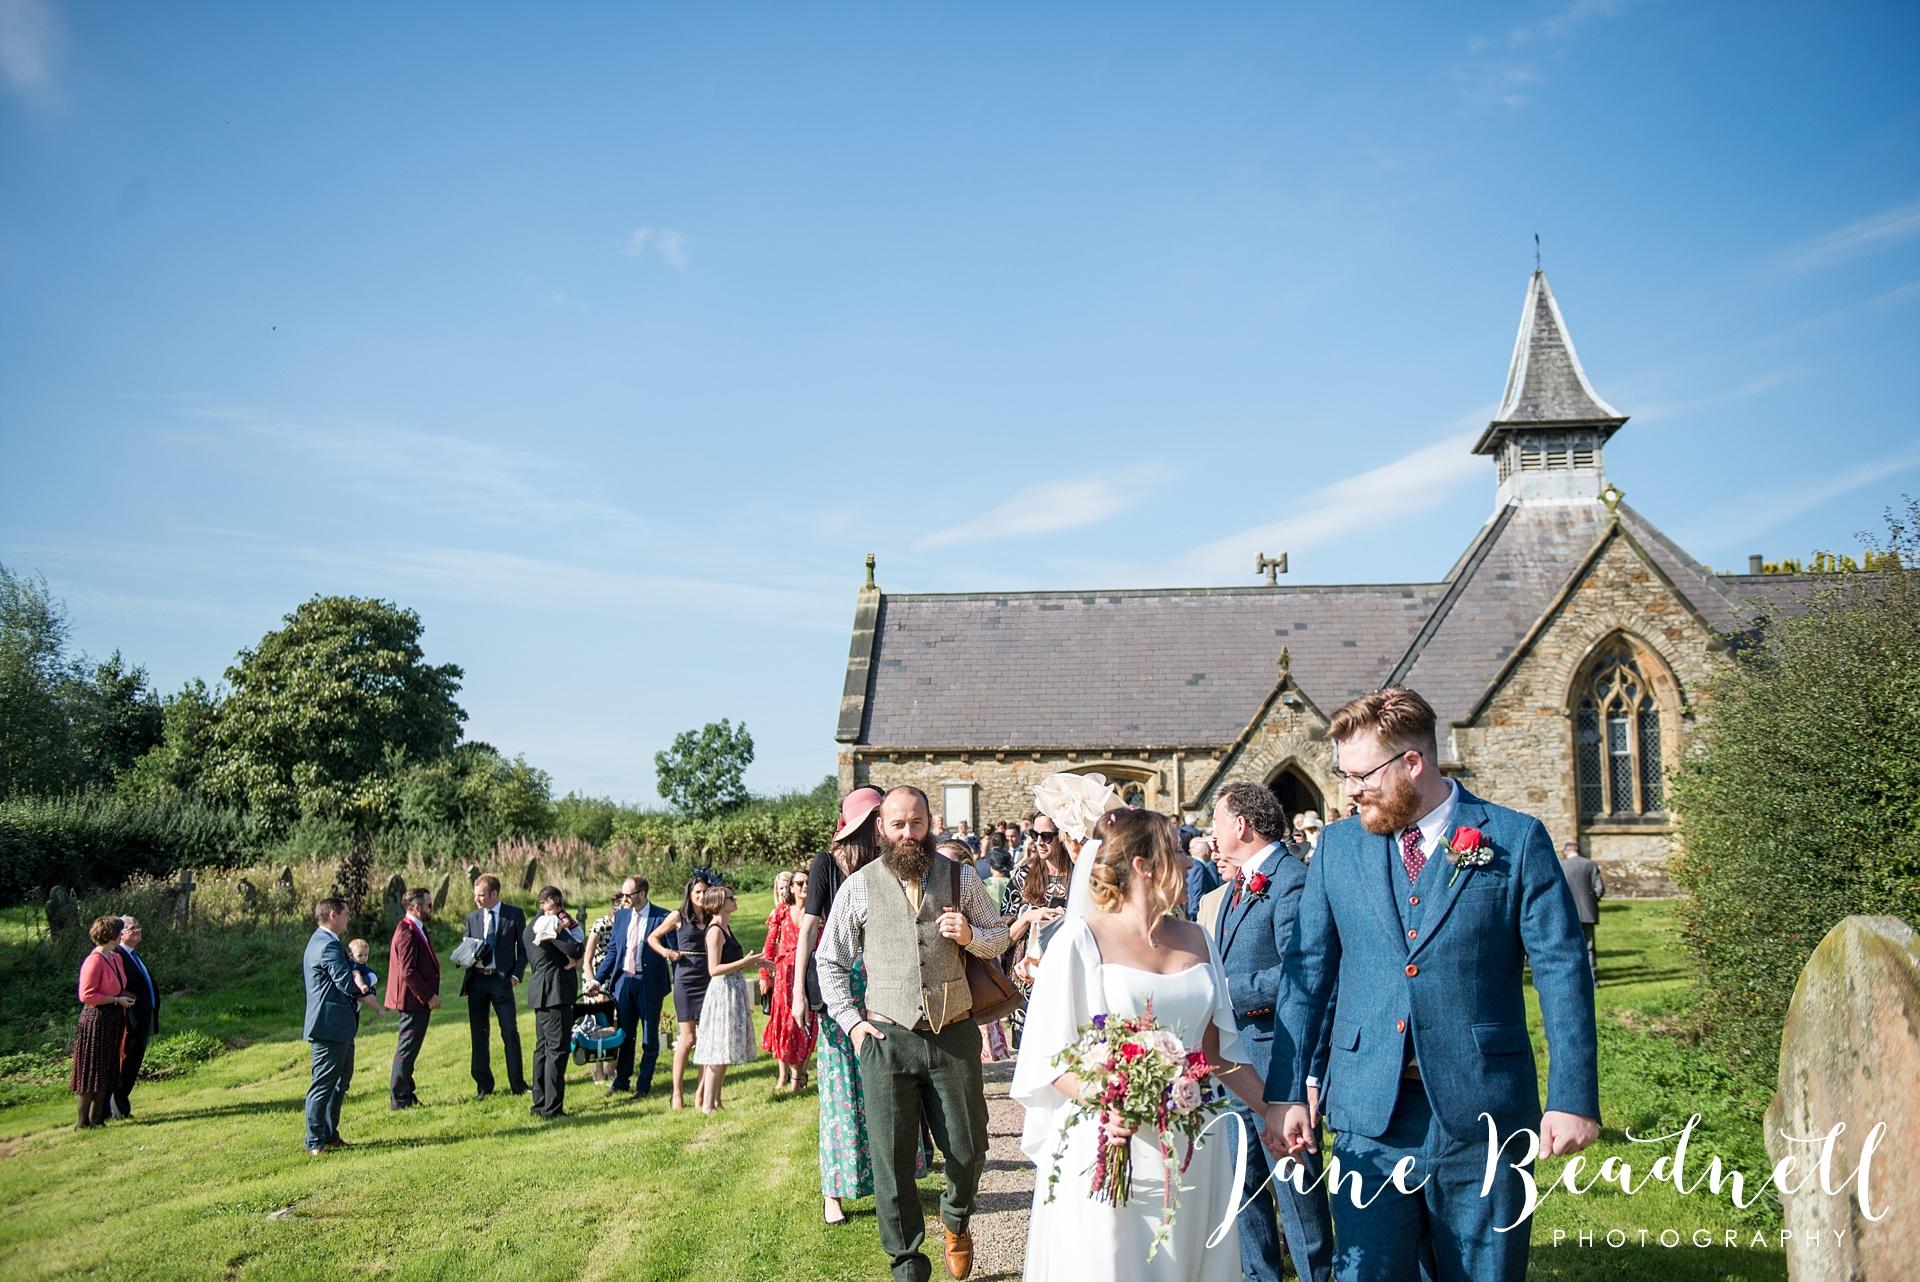 fine-art-wedding-photographer-jane-beadnell-yorkshire-wedding-photographer_0061